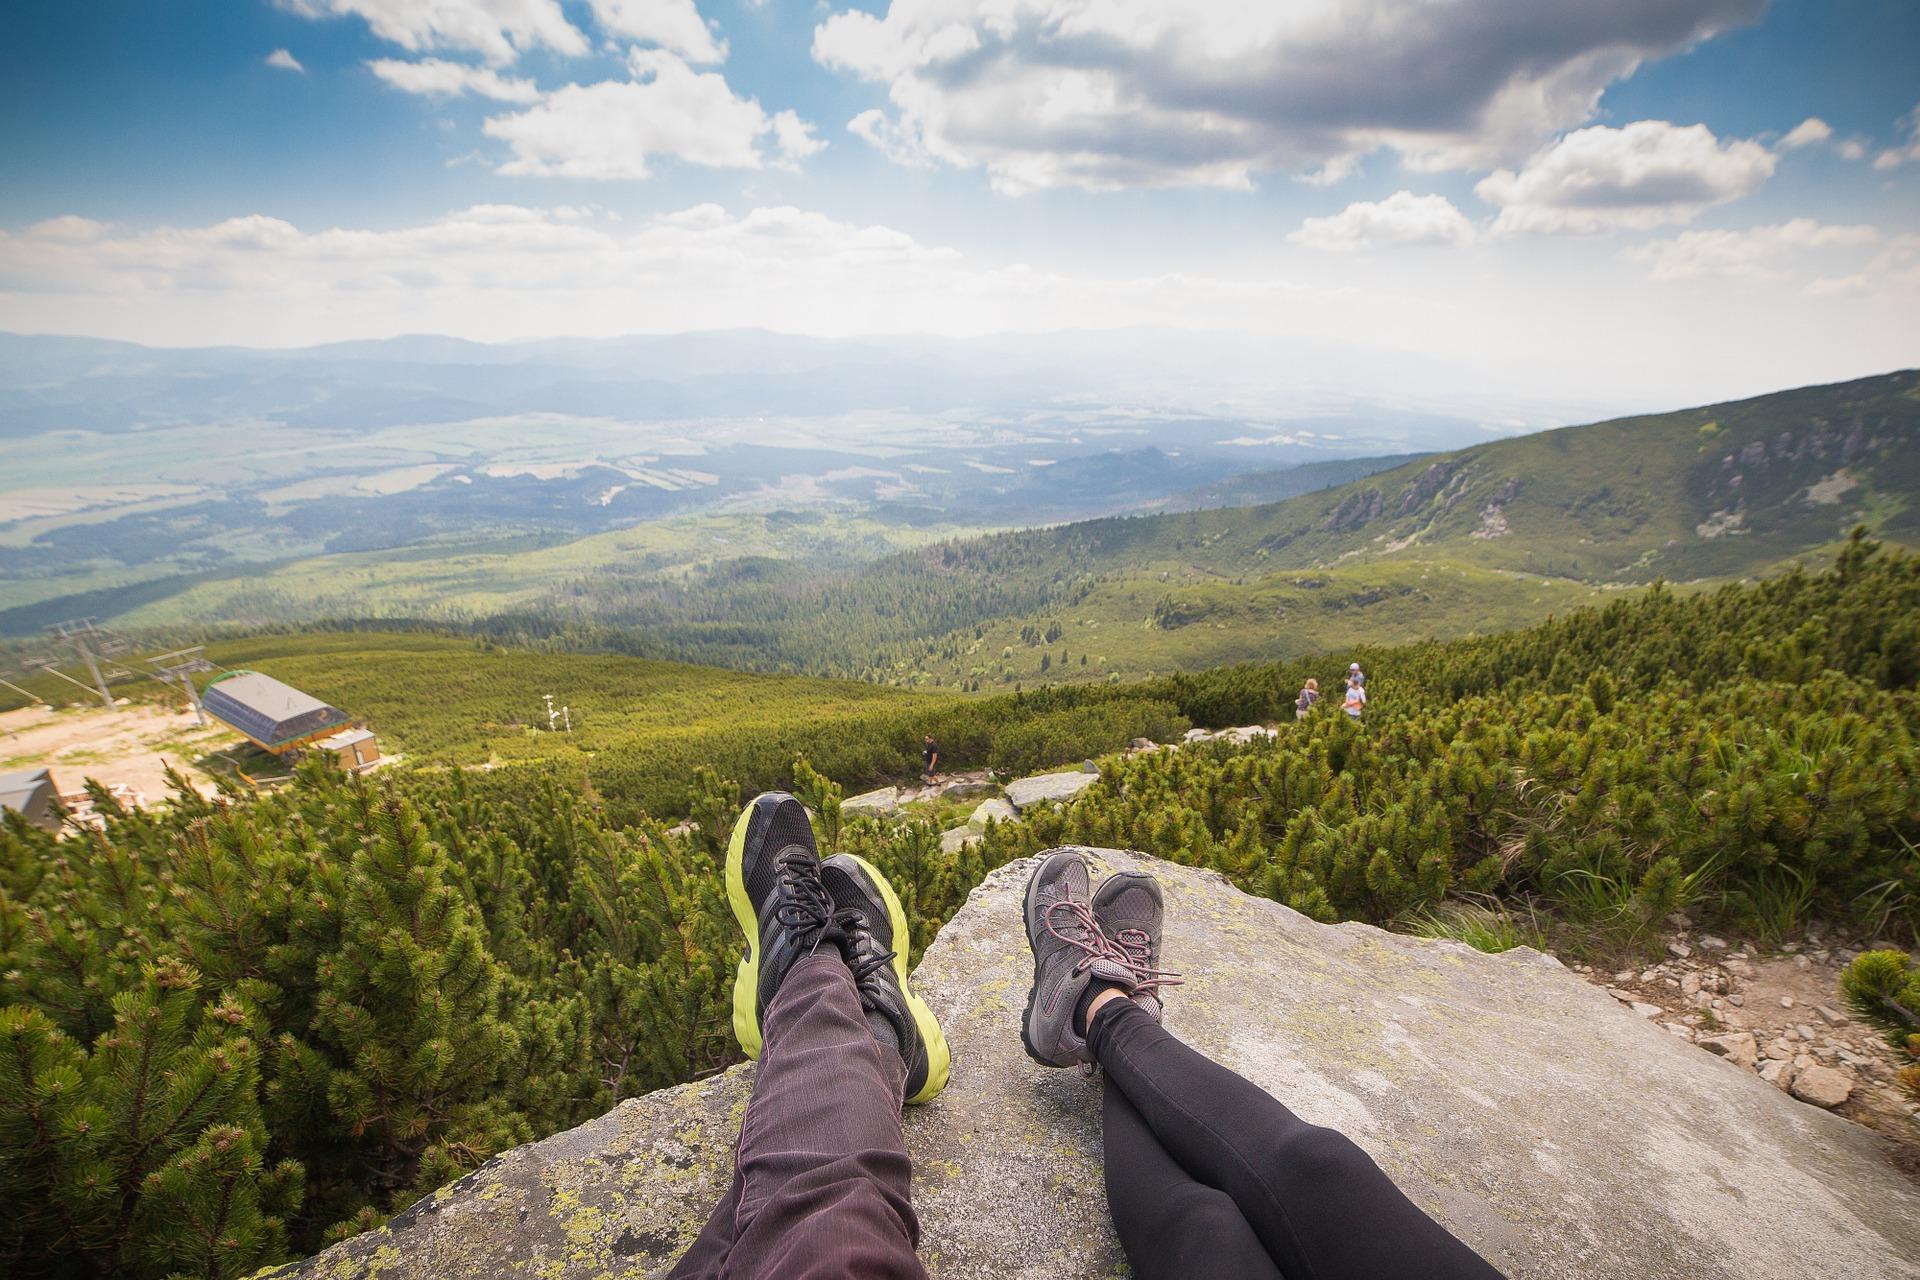 nicotine free, goodbye nicotine, climb that mountain, I did it!, the view is amazing